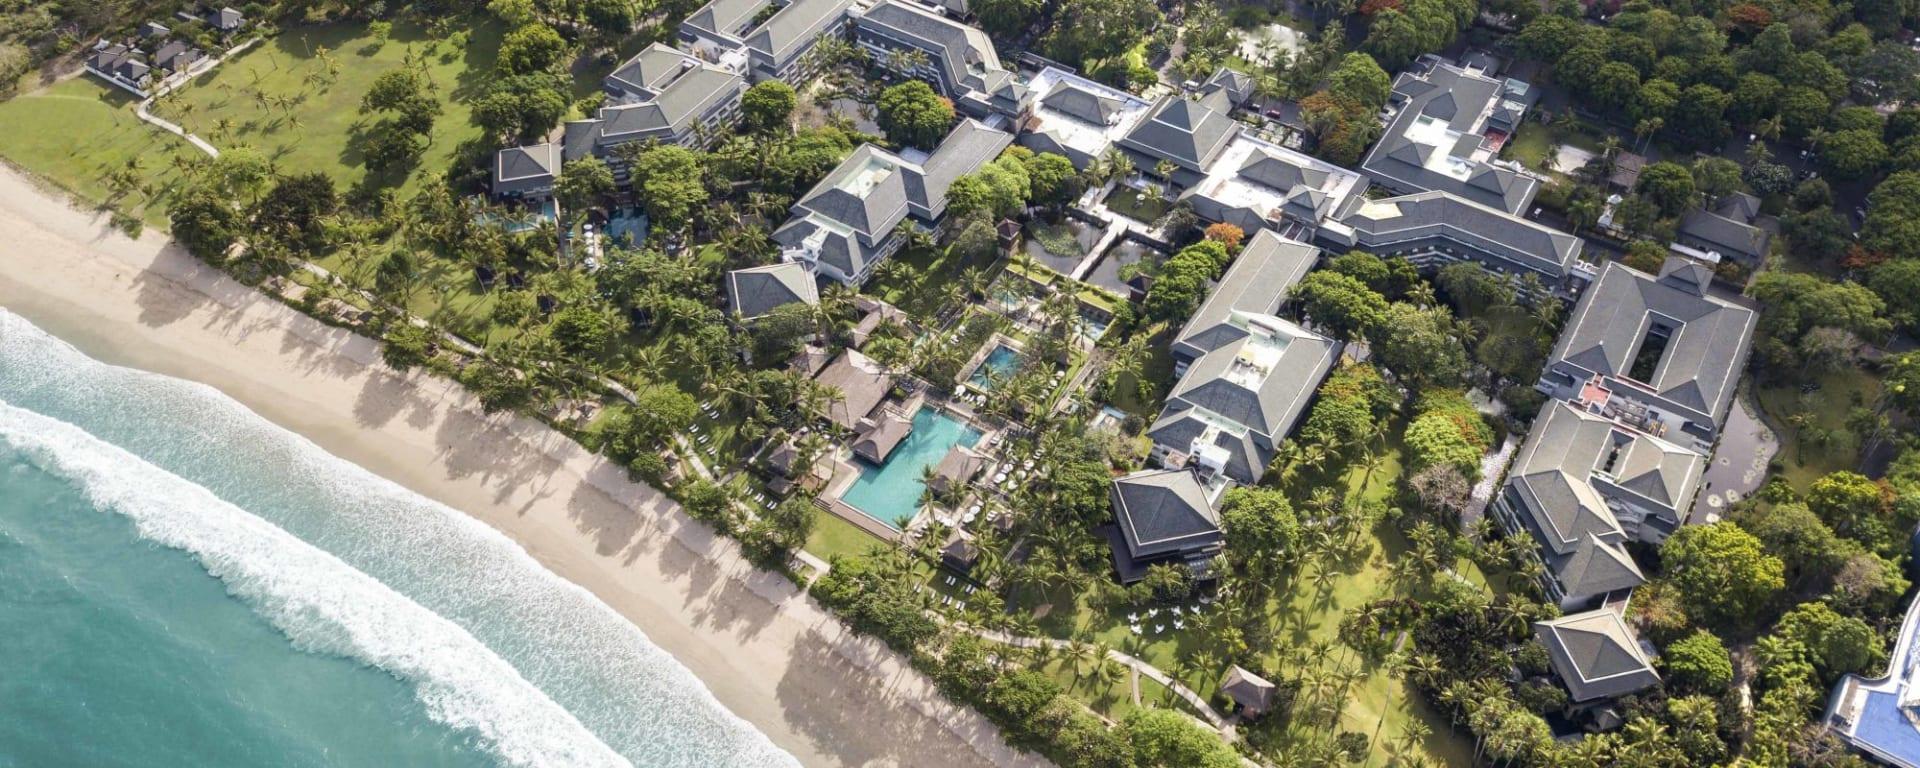 InterContinental Bali Resort à Sud de Bali: Aerial